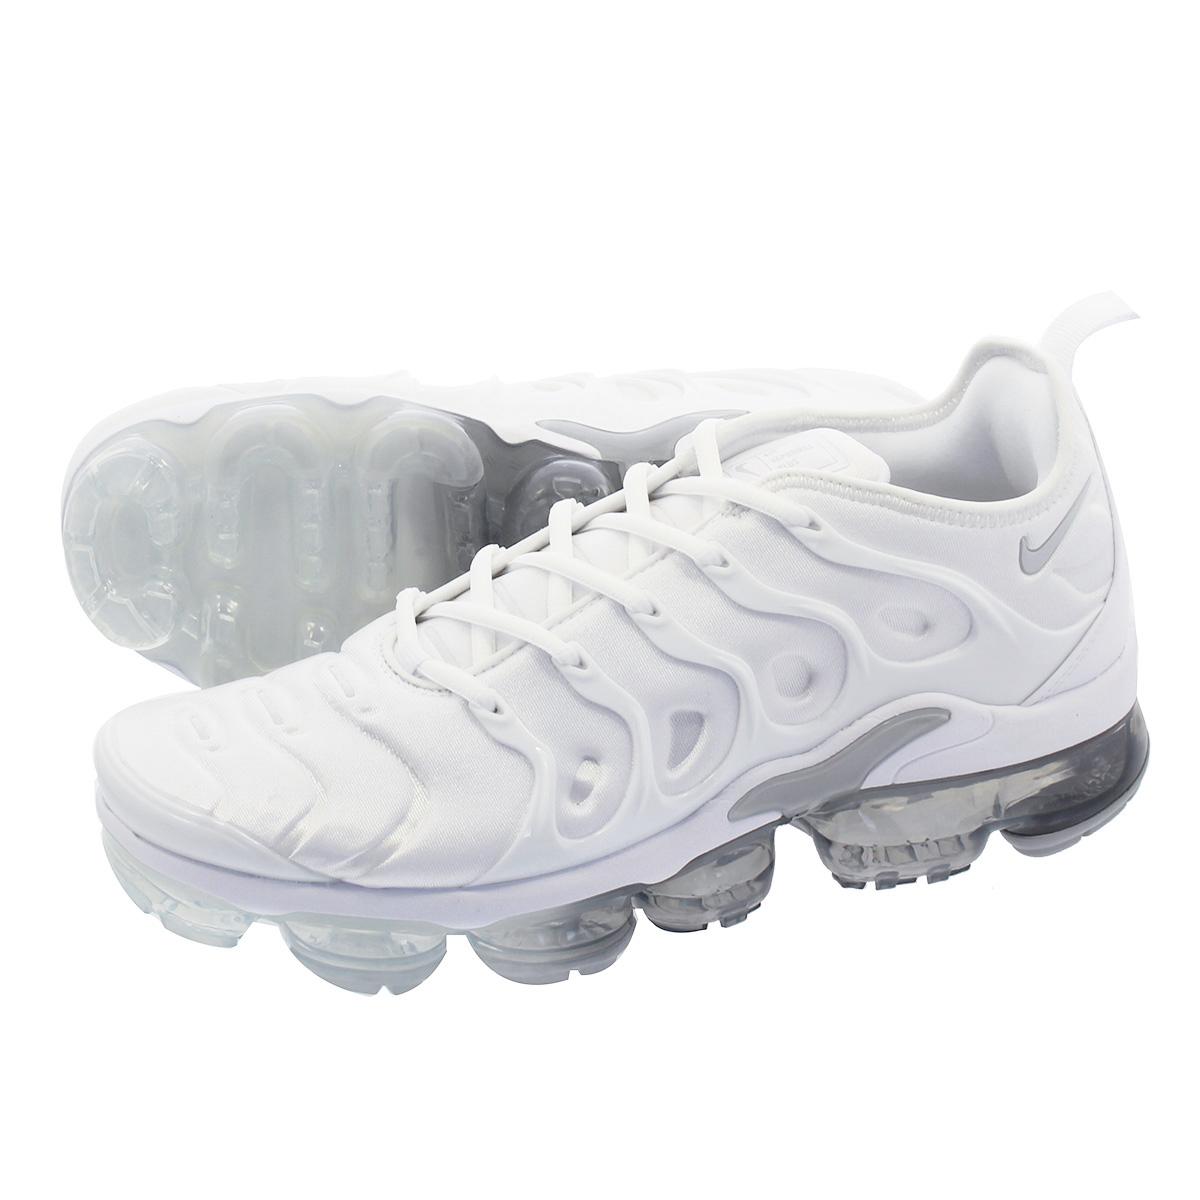 00fbe748975 NIKE AIR VAPORMAX PLUS Nike vapor max plus WHITE PURE PLATINUM WOLF GREY  924